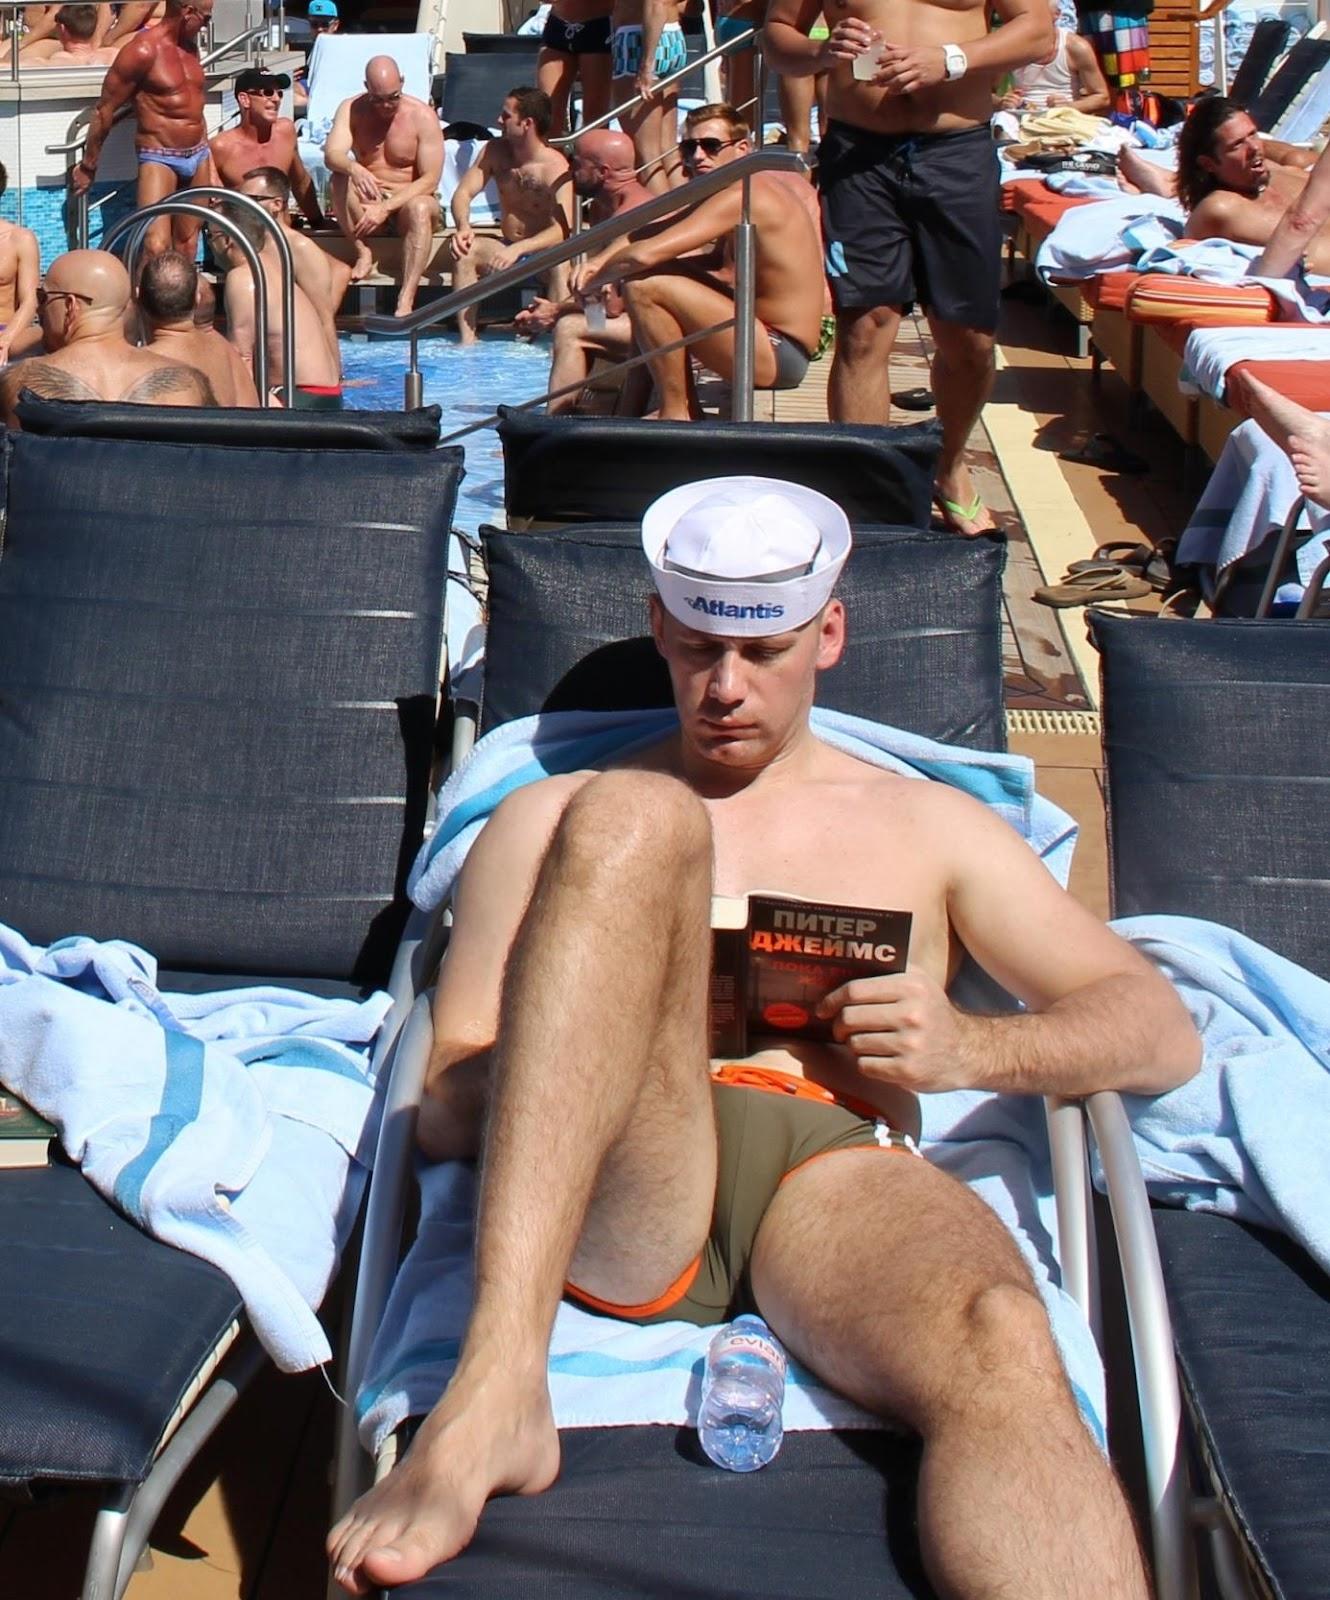 https://gaygroom.files.wordpress.com/2014/07/celebrity-cruise-2014-248.jpg